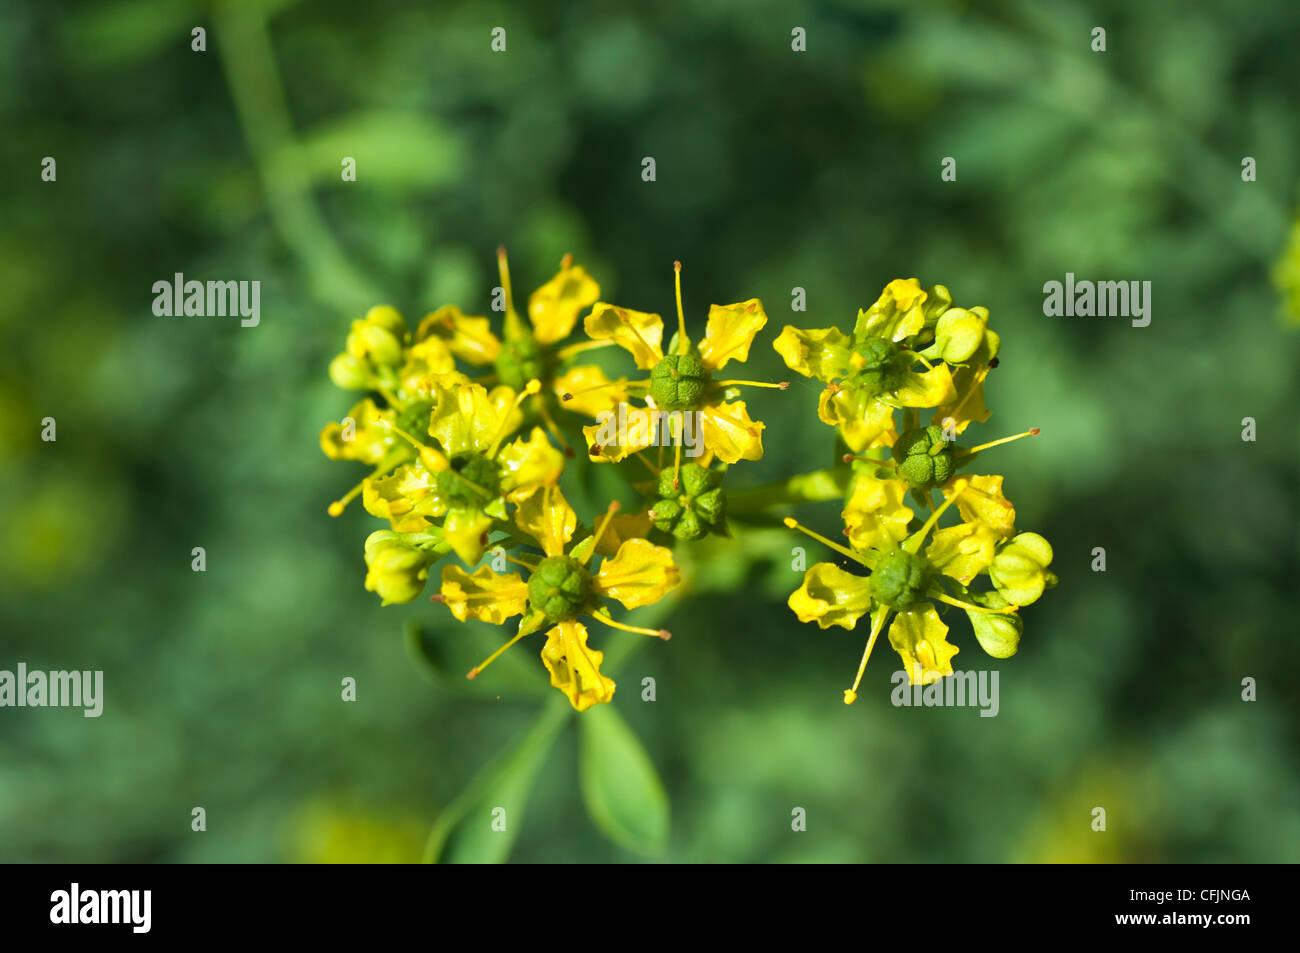 Small yellow flowers of Common Rue, Ruta graveolens, Rutaceae - Stock Image